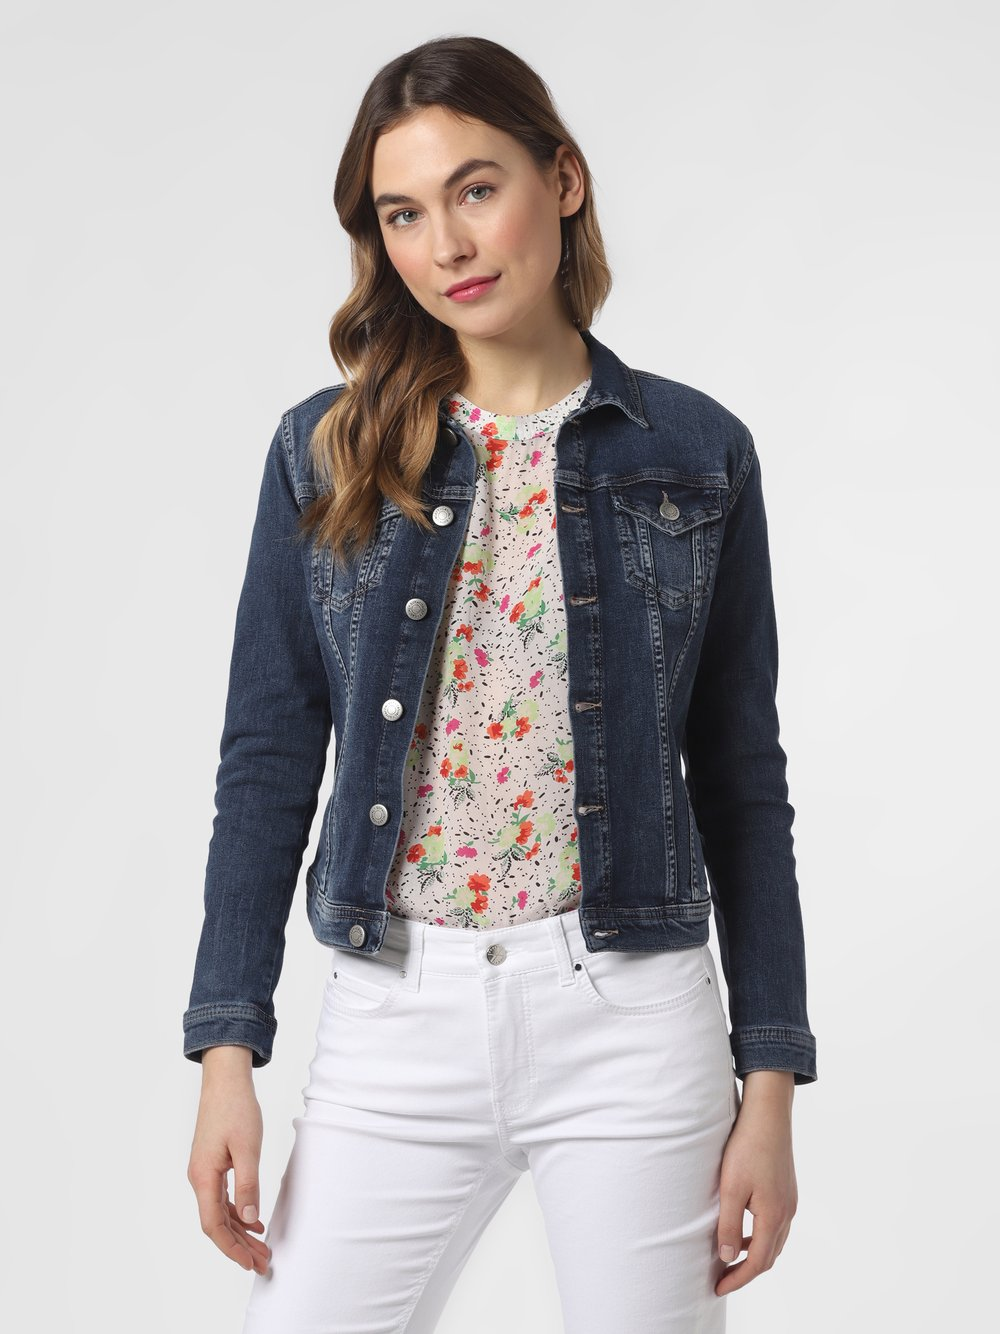 soyaconcept® – Damska kurtka jeansowa – Gela, niebieski Van Graaf 466199-0001-09970